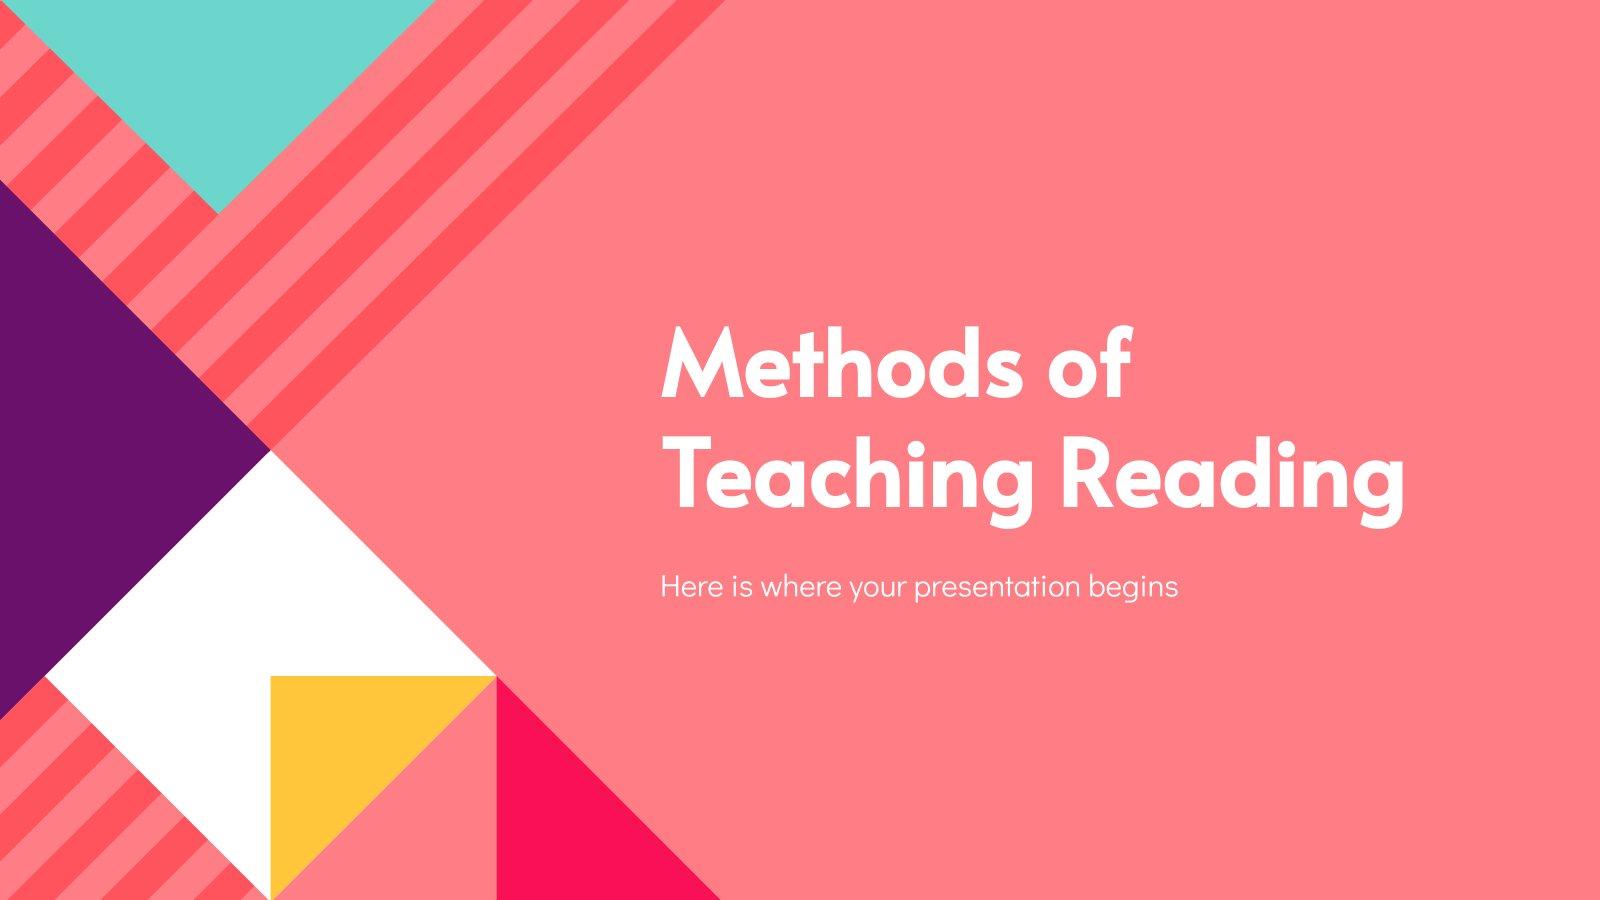 Methods of Teaching Reading presentation template